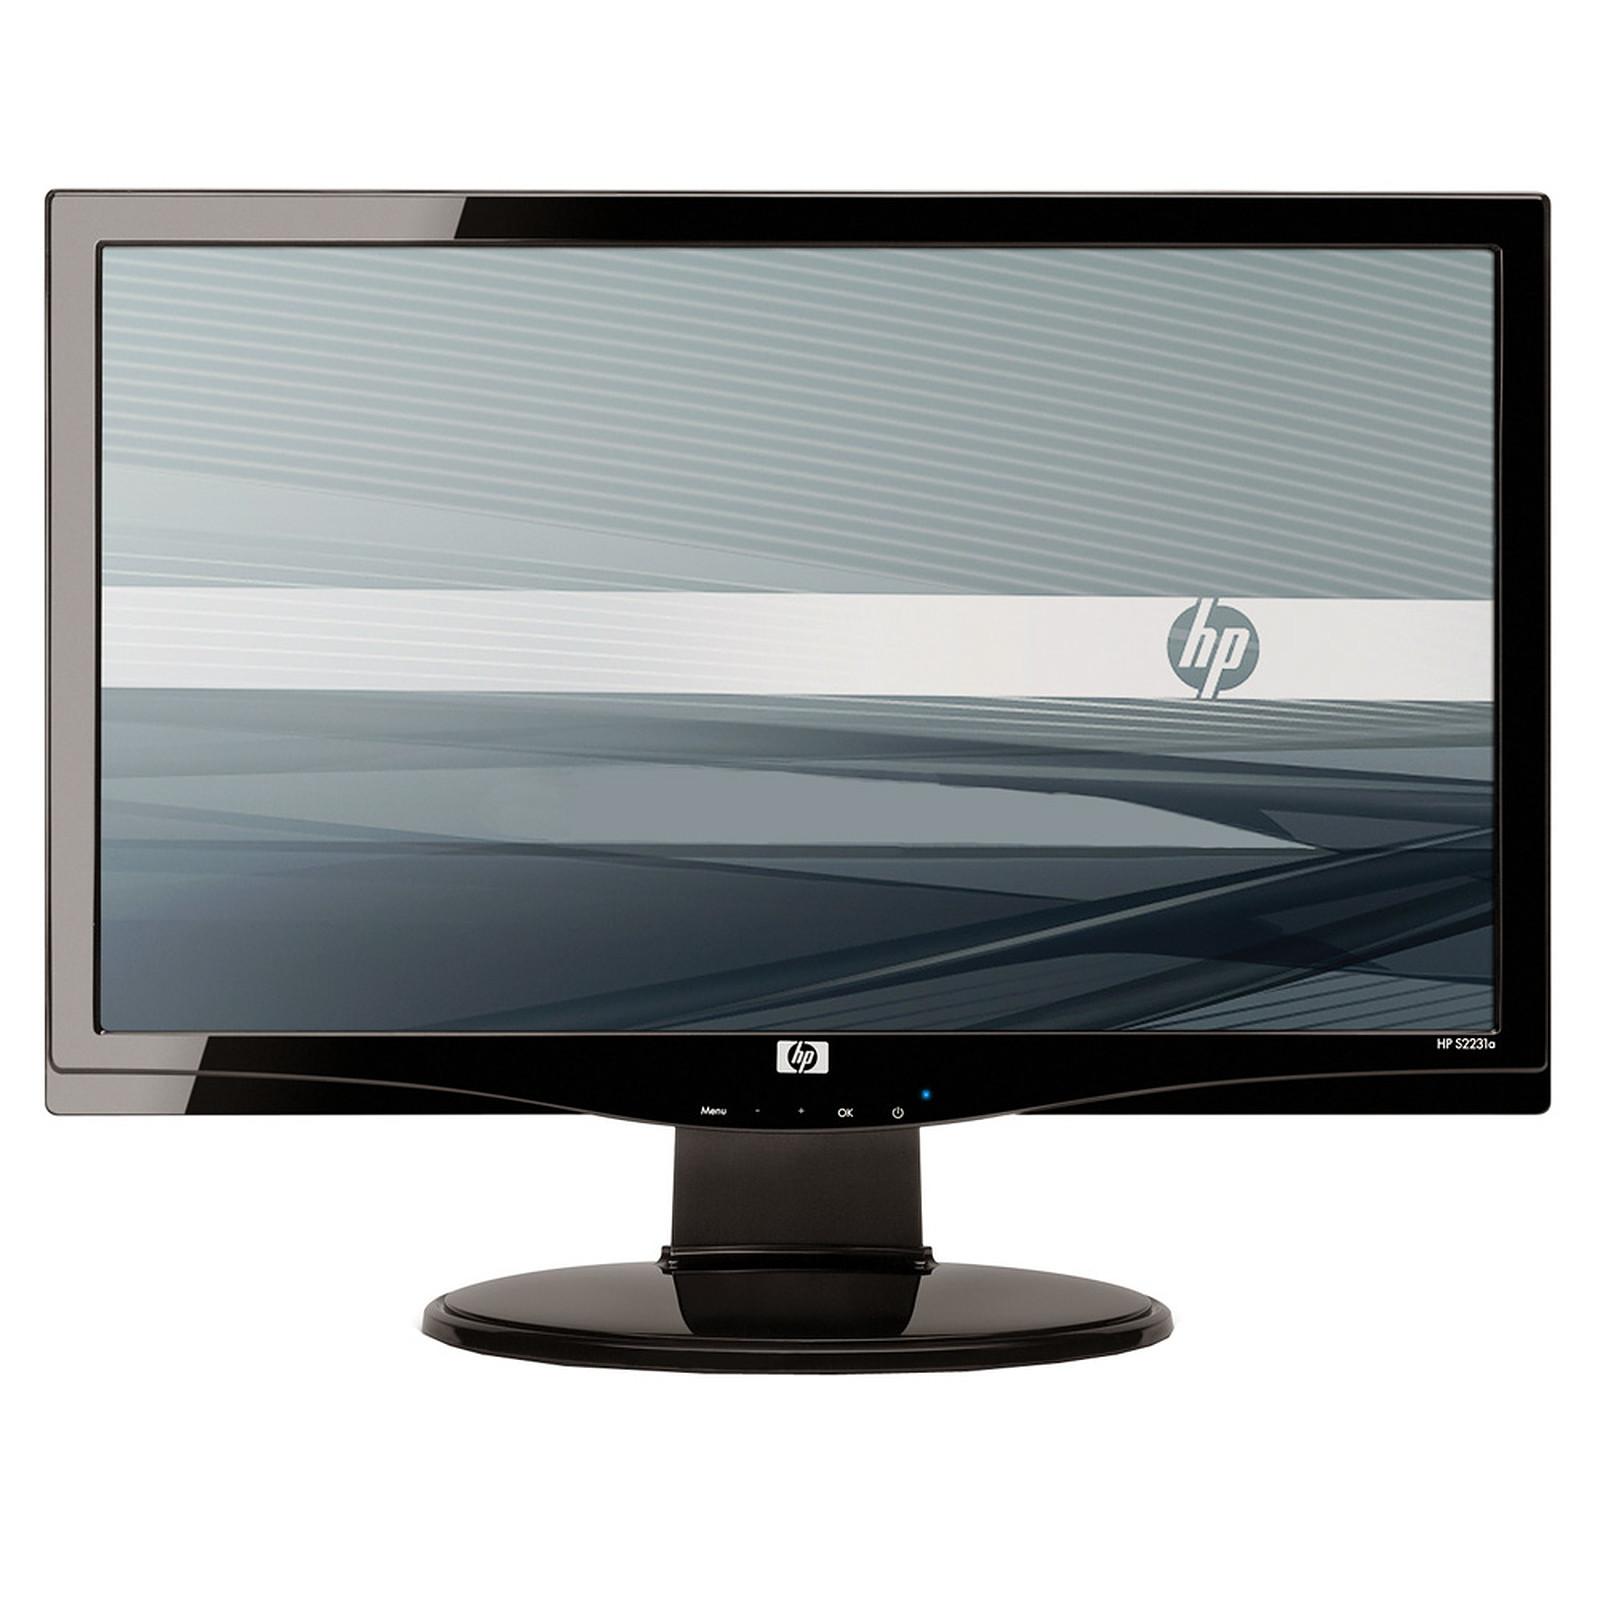 "HP 21.5"" LCD - S2231"